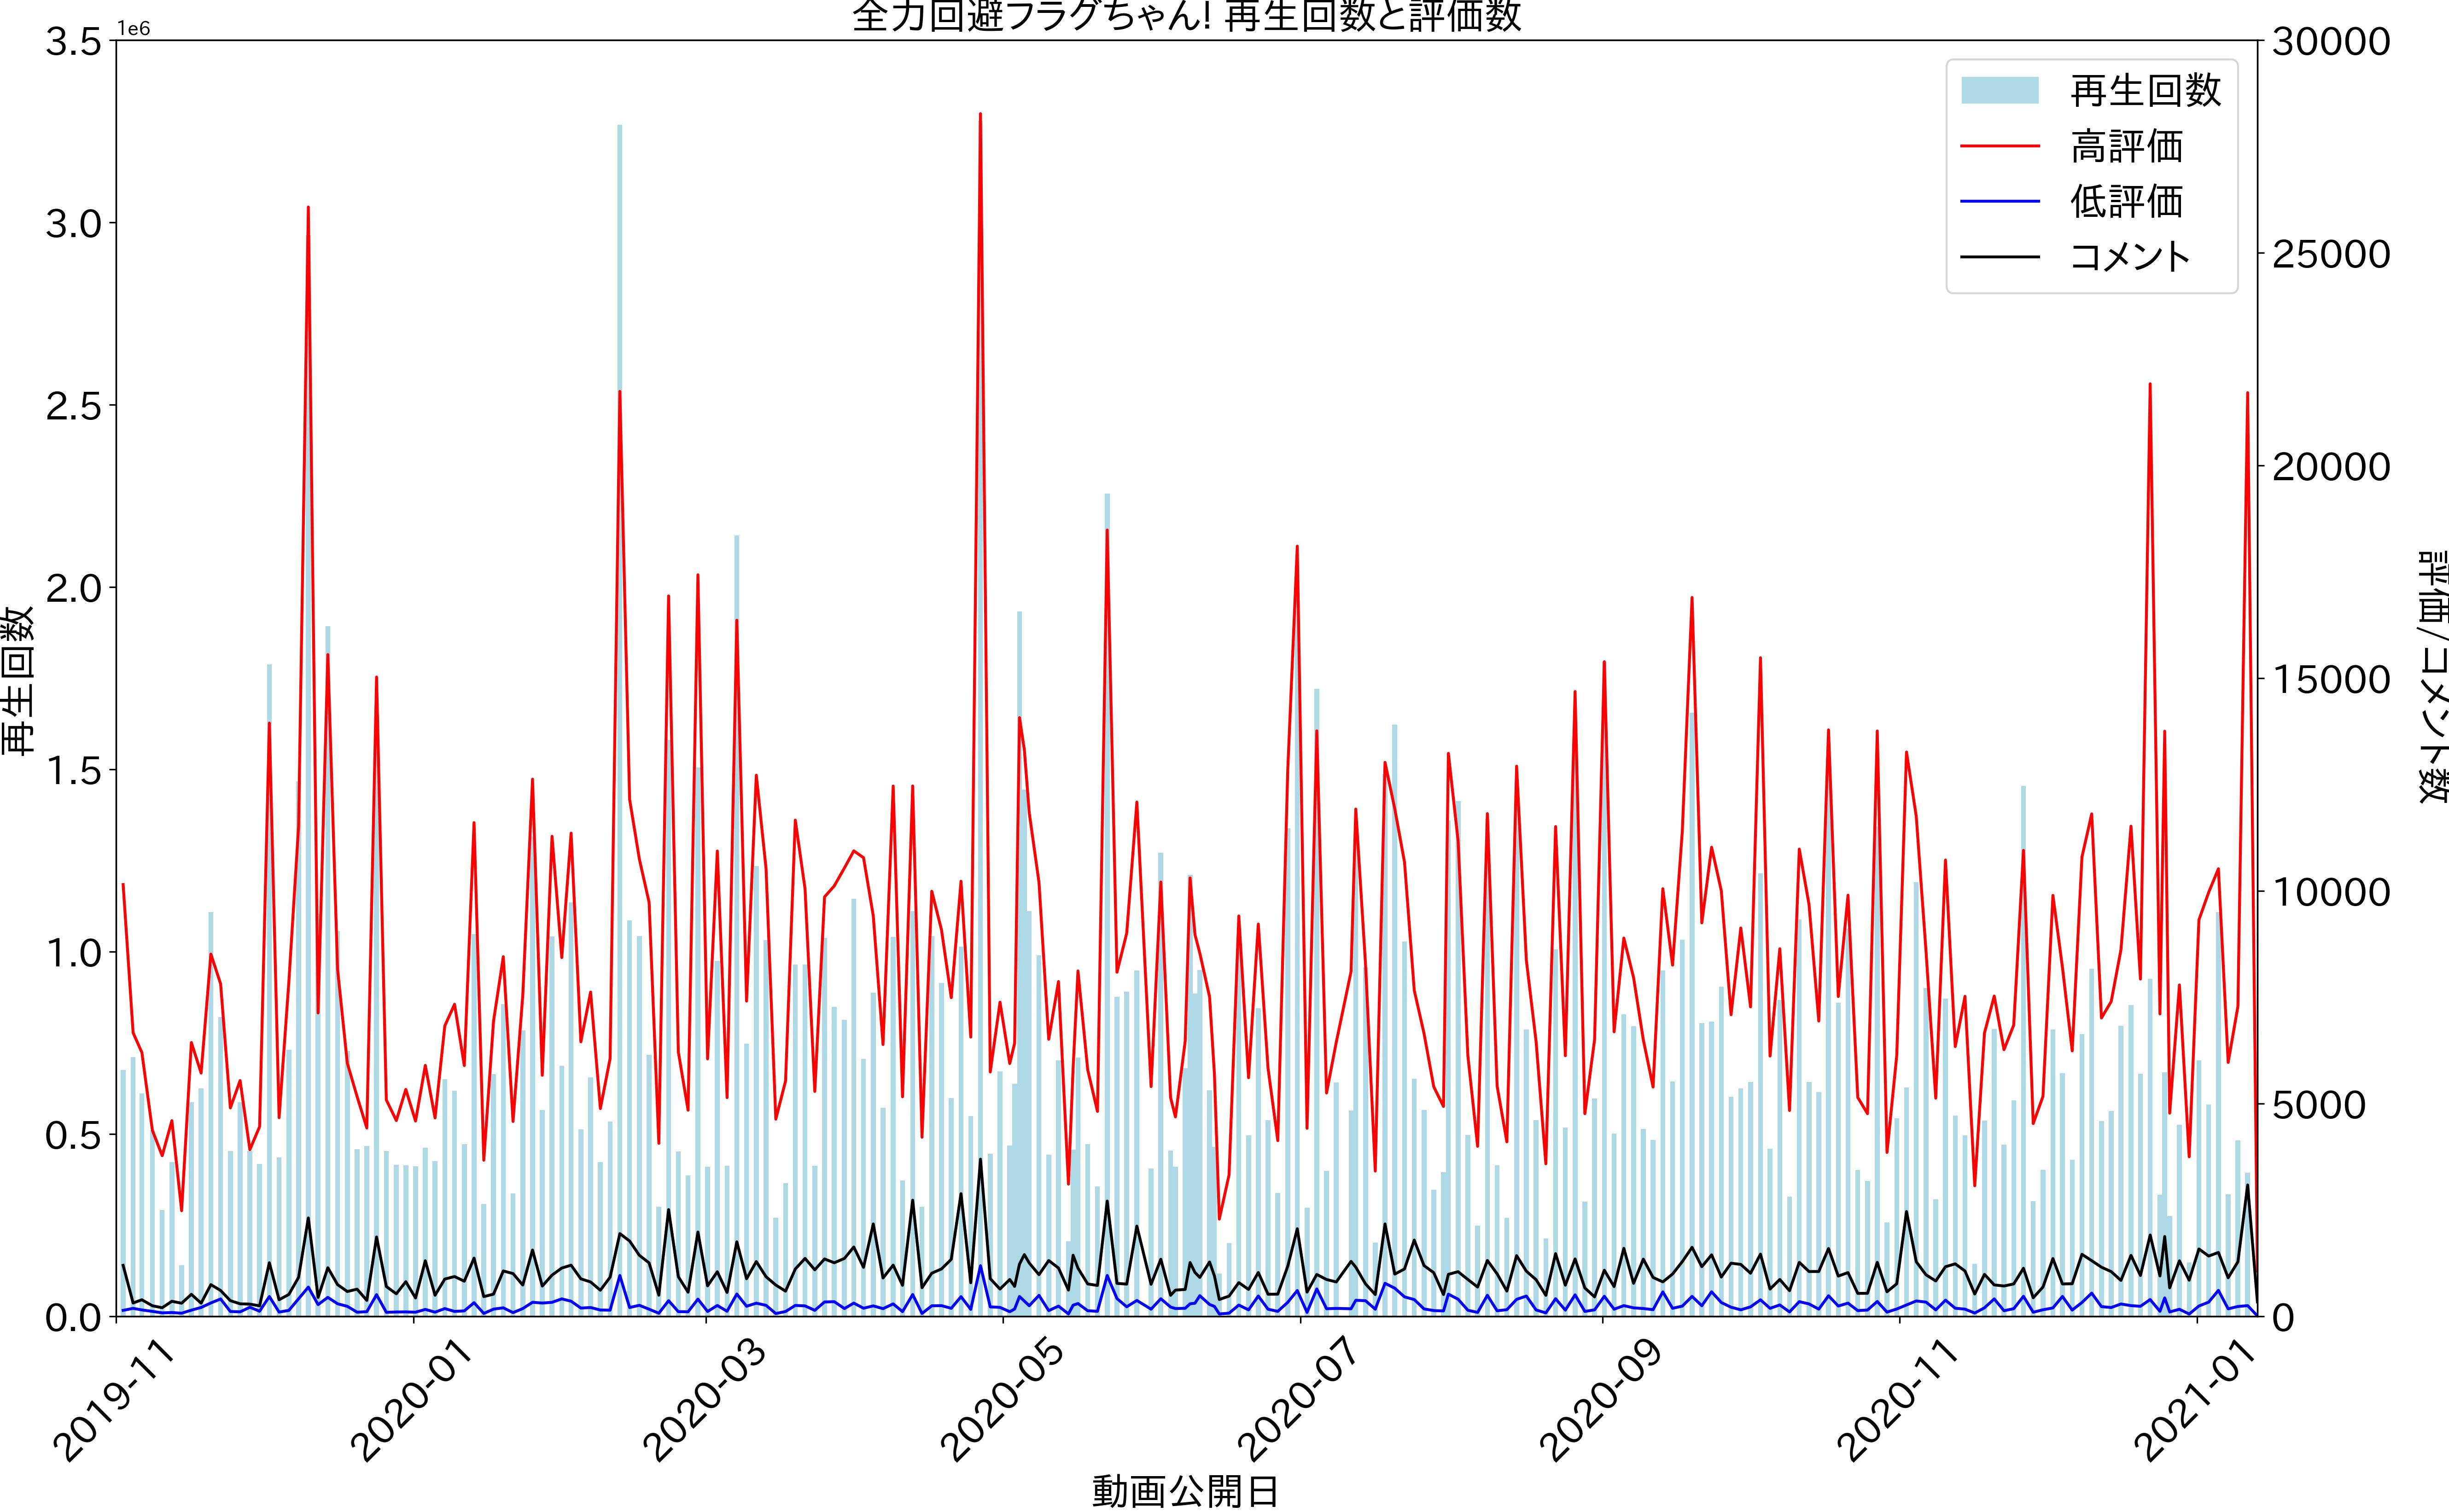 2021-01-13_flag_videos_statistics_graph.png